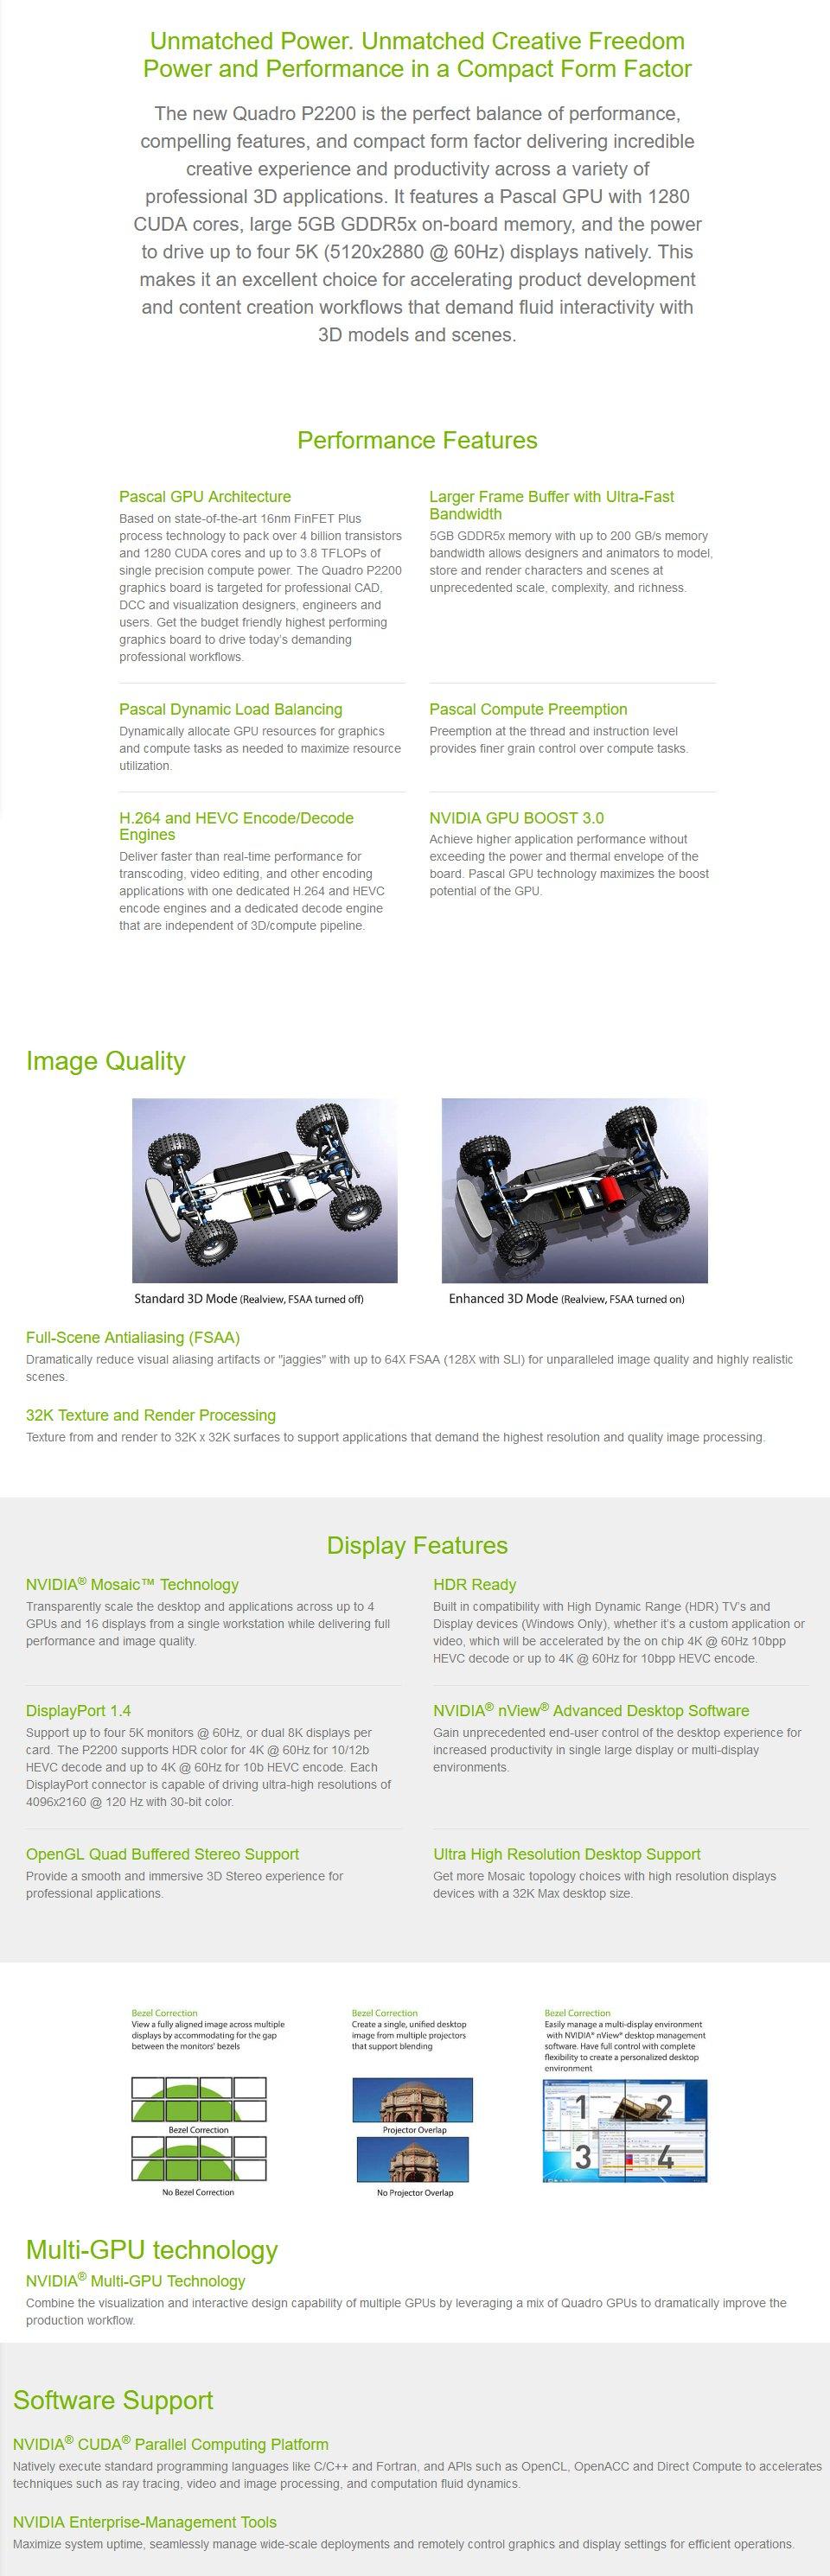 Leadtek Quadro P2200 5GB features